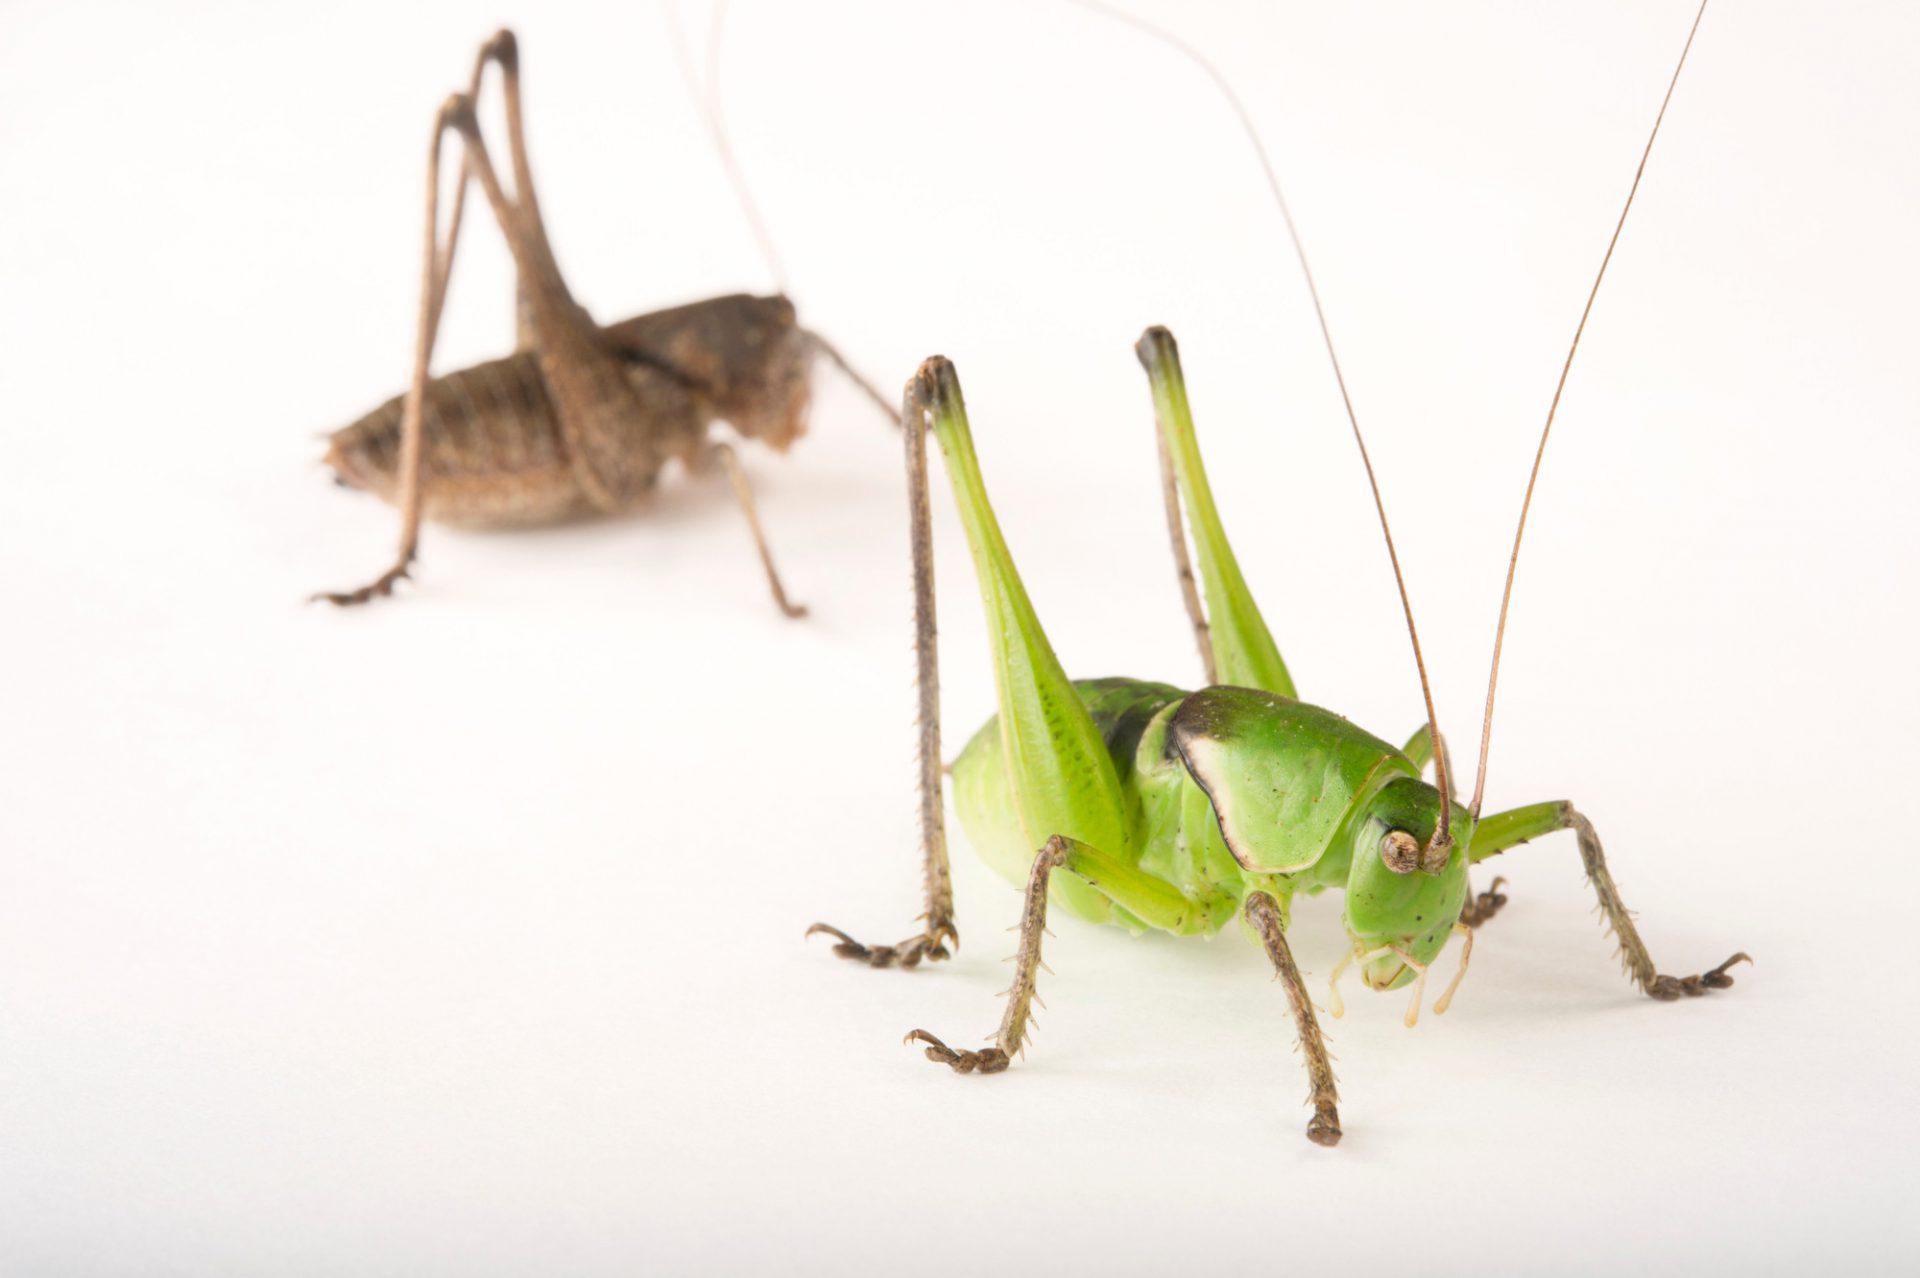 Picture of two Haldeman's shieldback katydids (Pediodectes haldemani) at the Dallas Zoo.